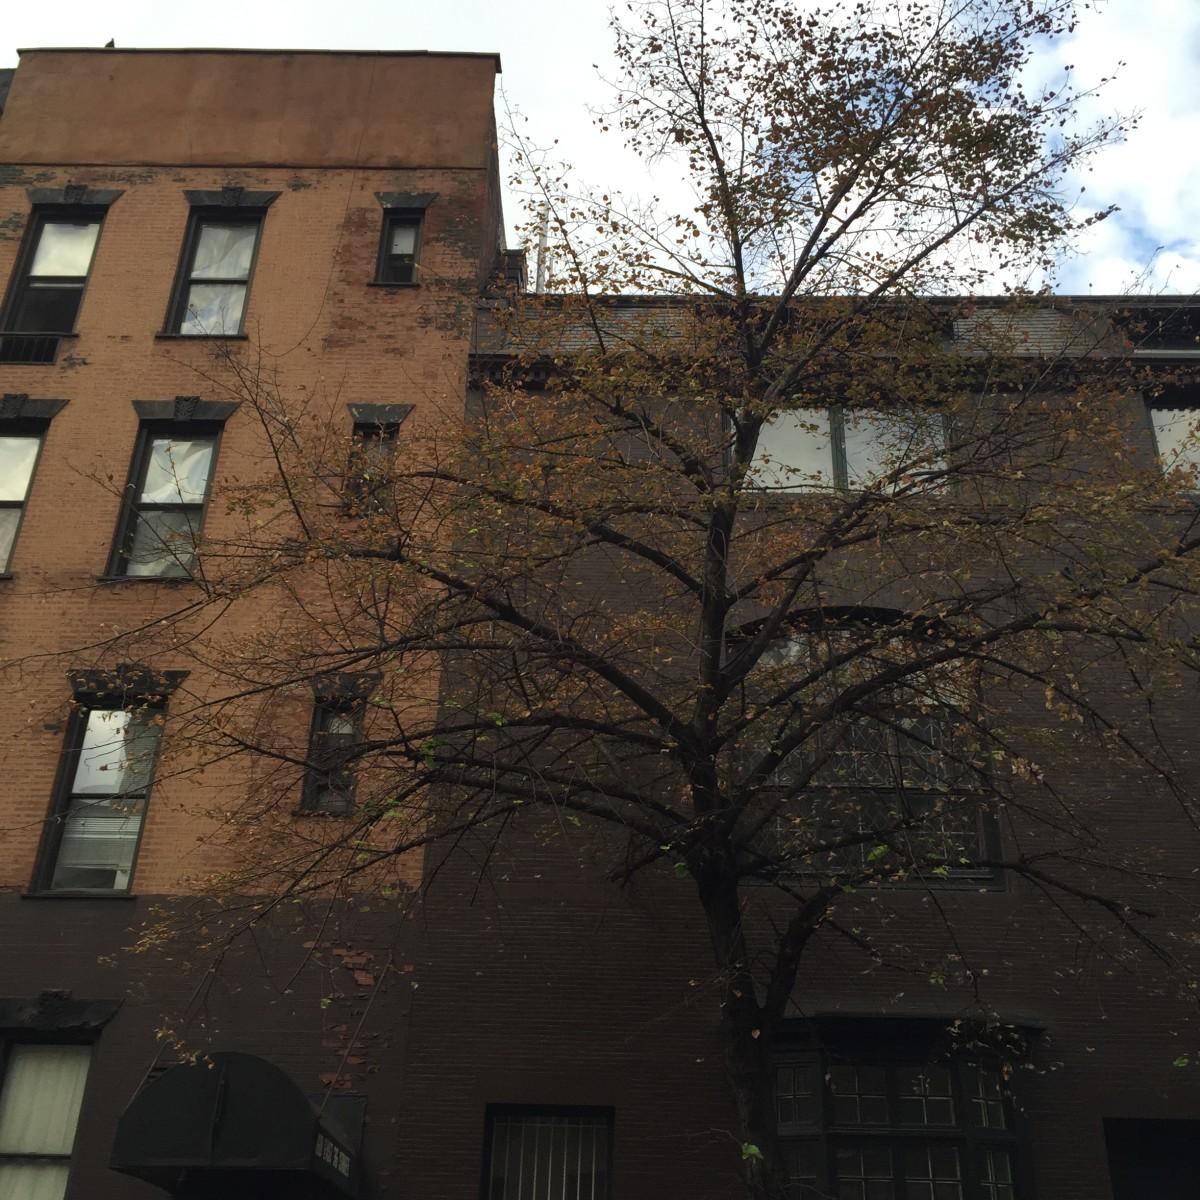 {The changing of seasons, in New York last week}